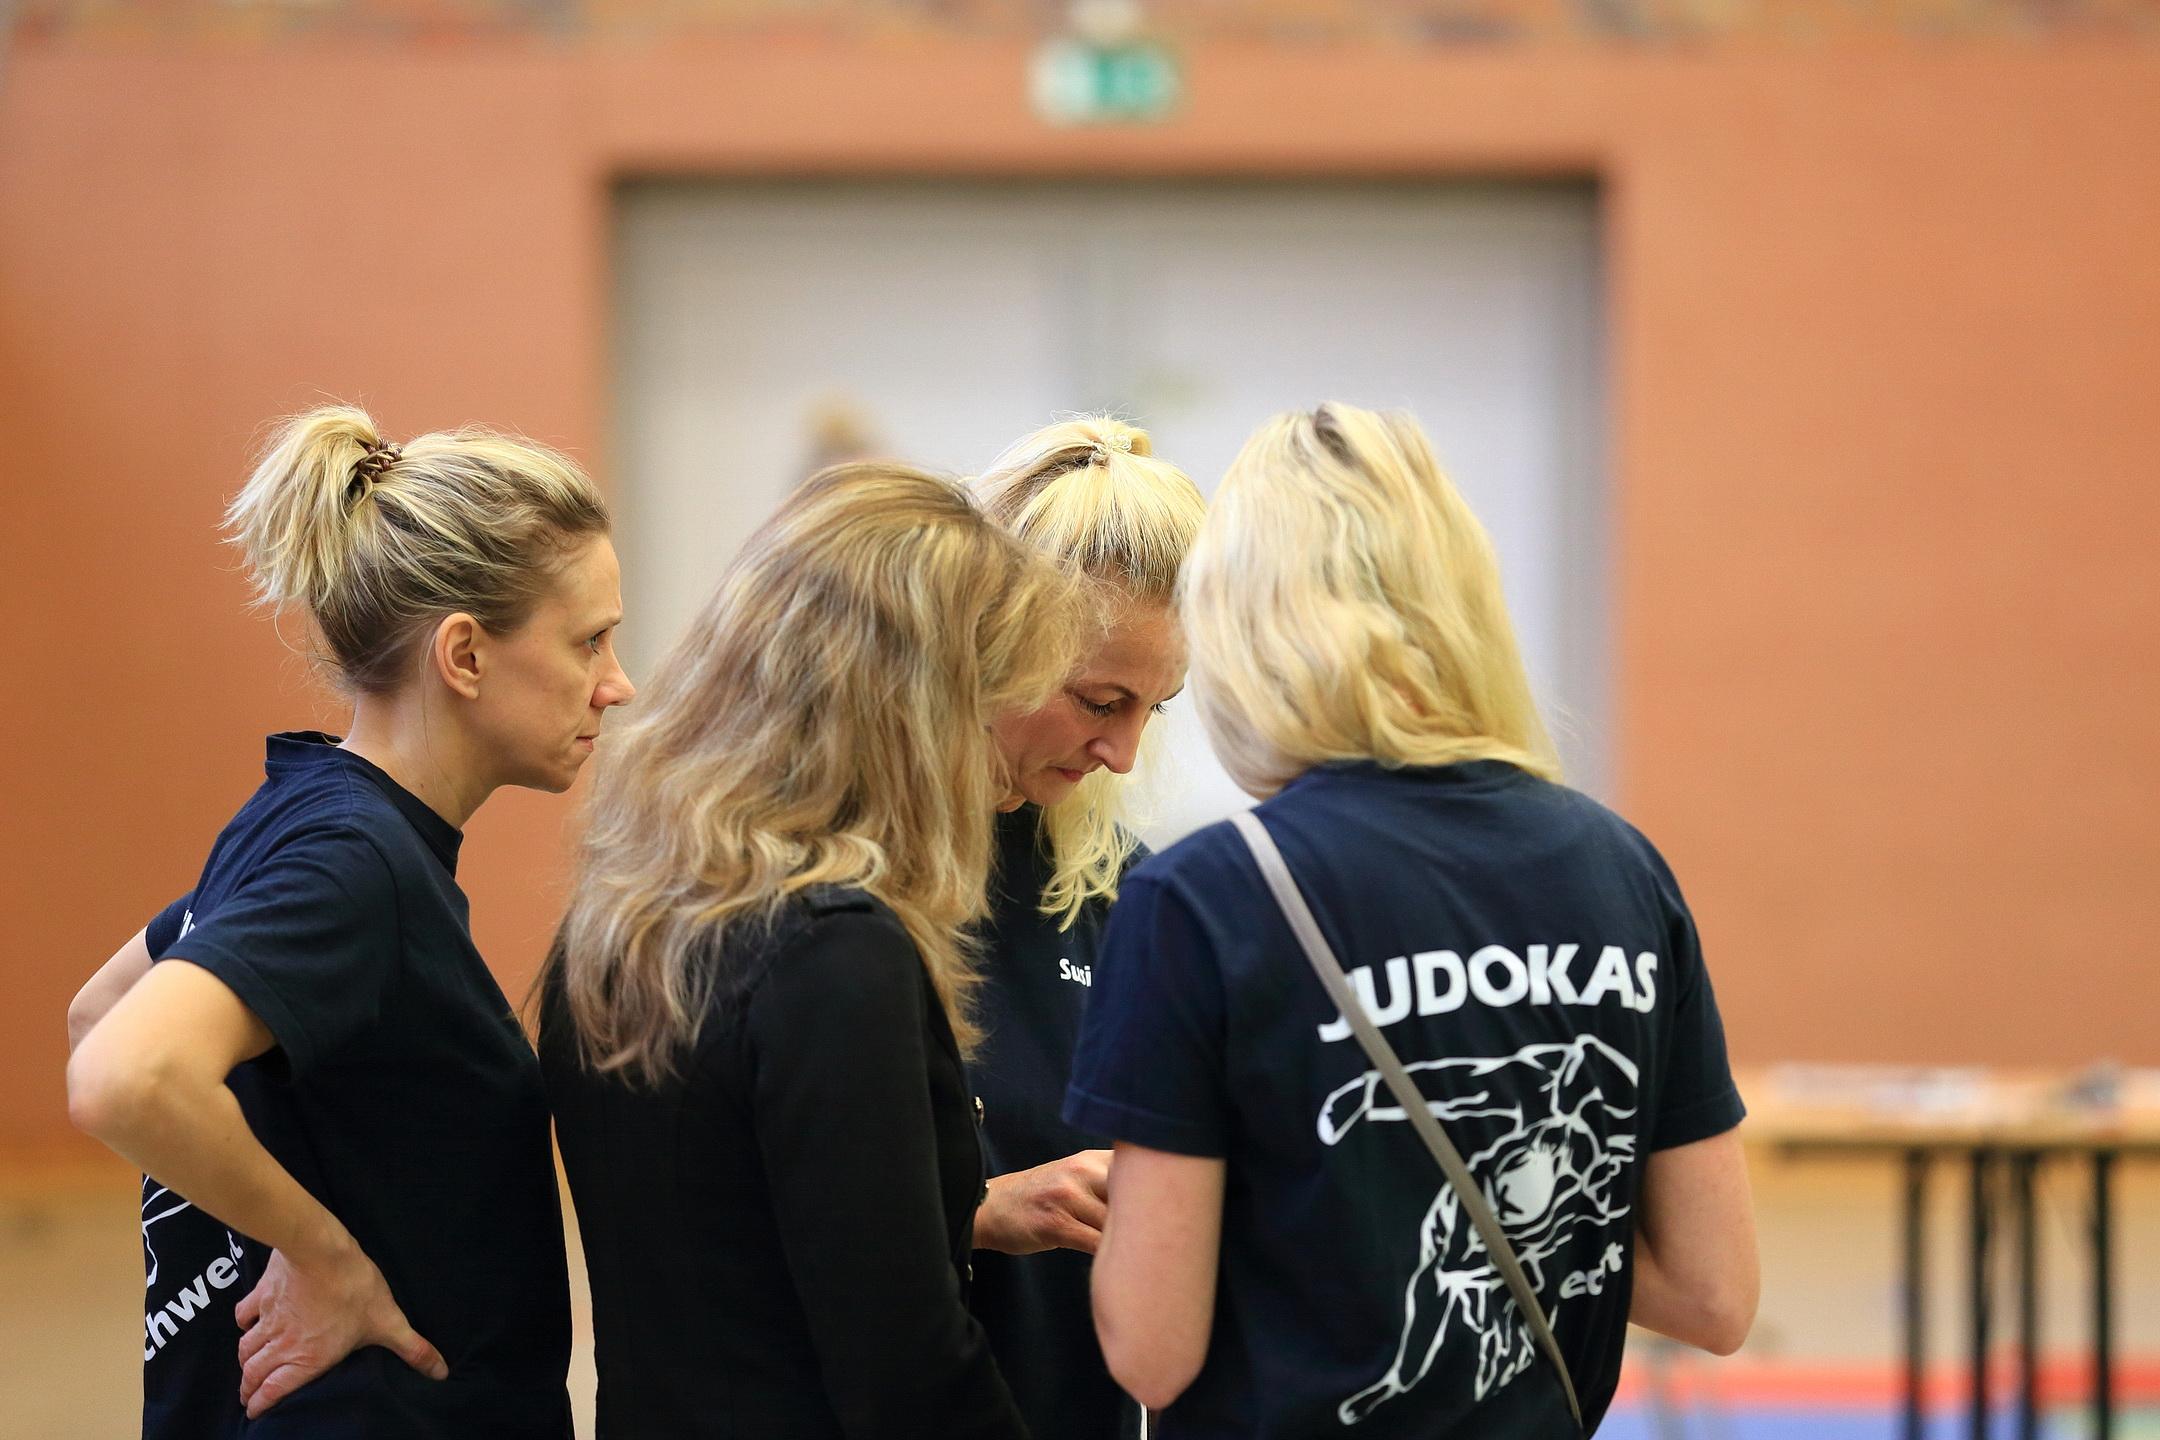 2016-Nikolausturnier Judokas Schwedt (23)